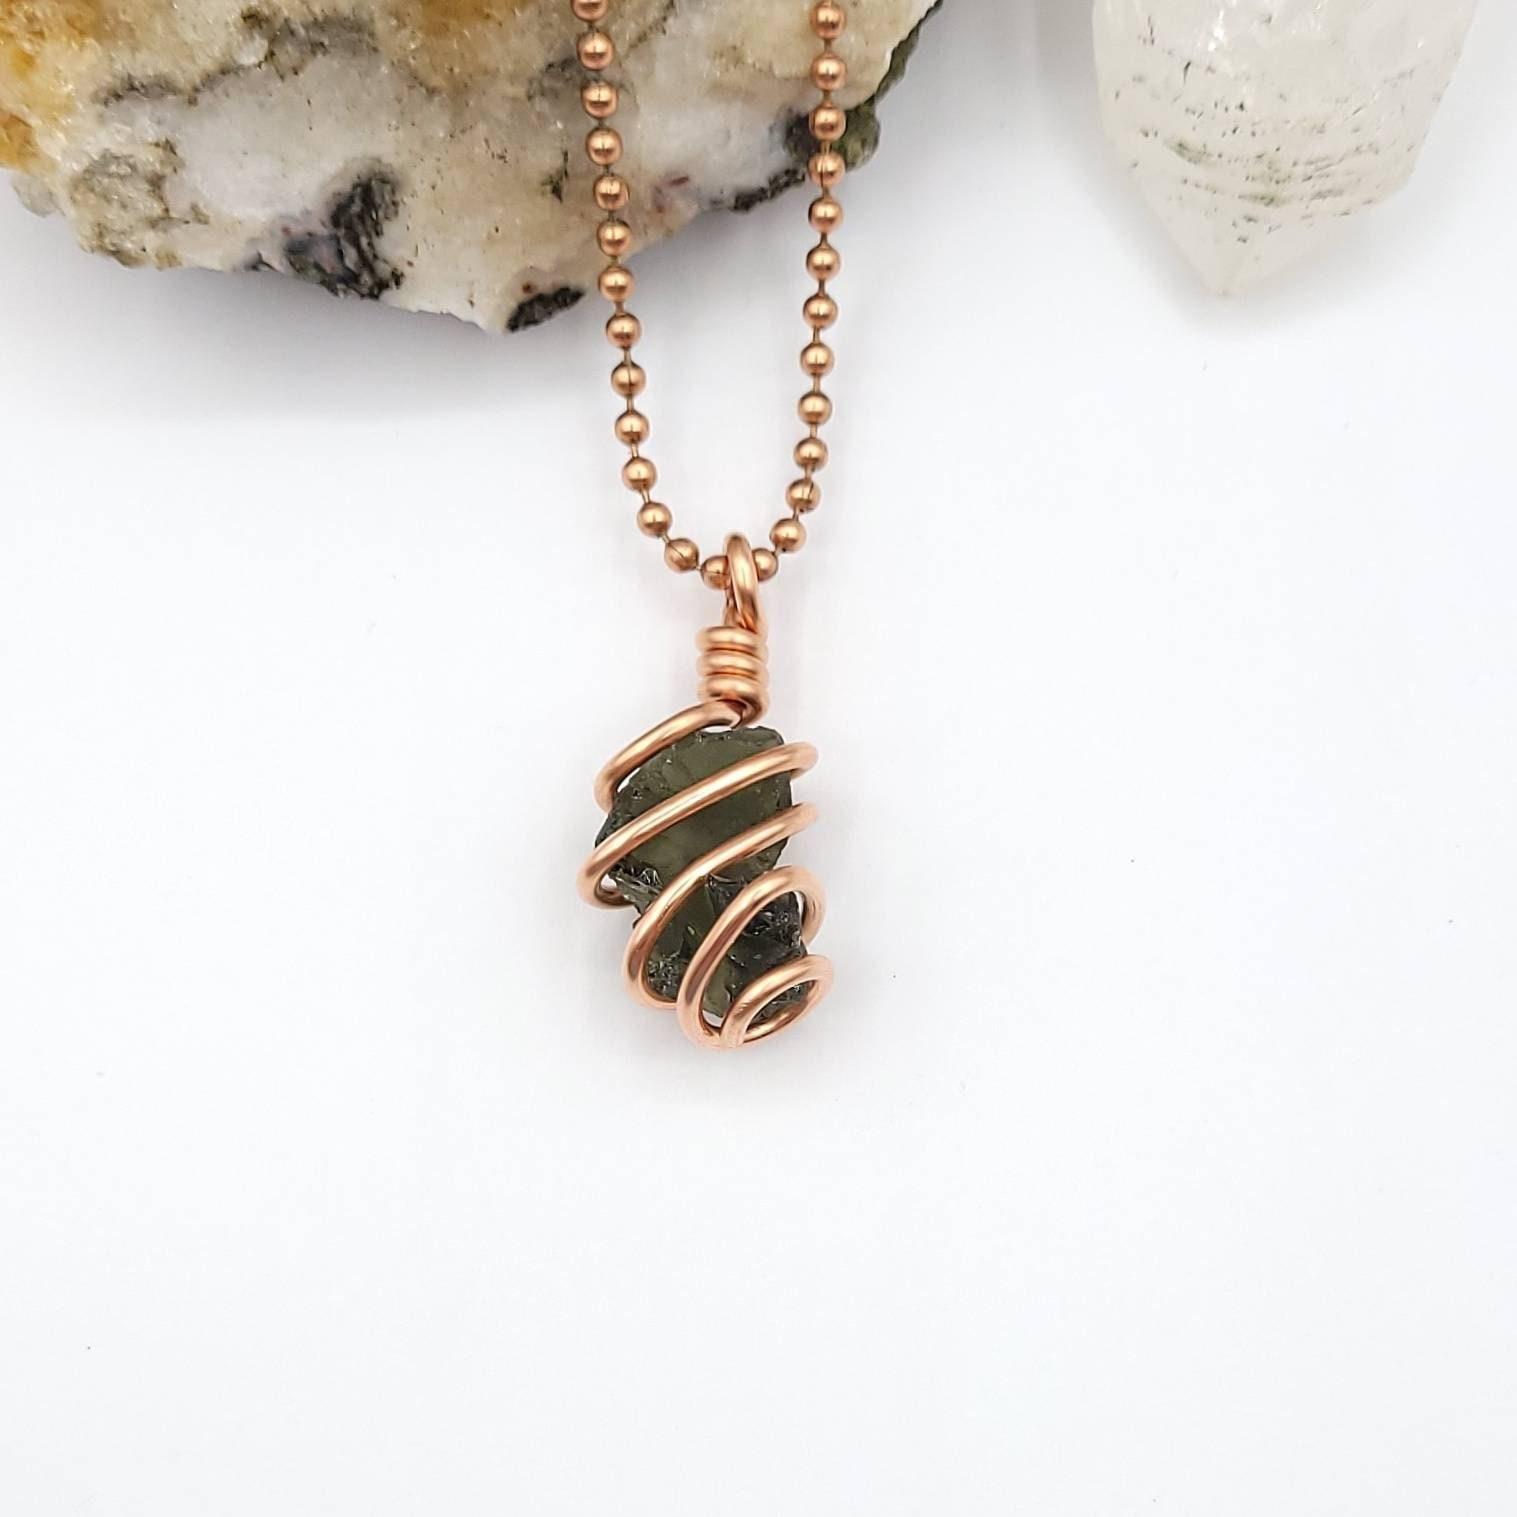 Moldavite Necklace, Copper Wire Wrapped Moldavite Pendant, Tektite Jewelry, Rare Crystal Necklace